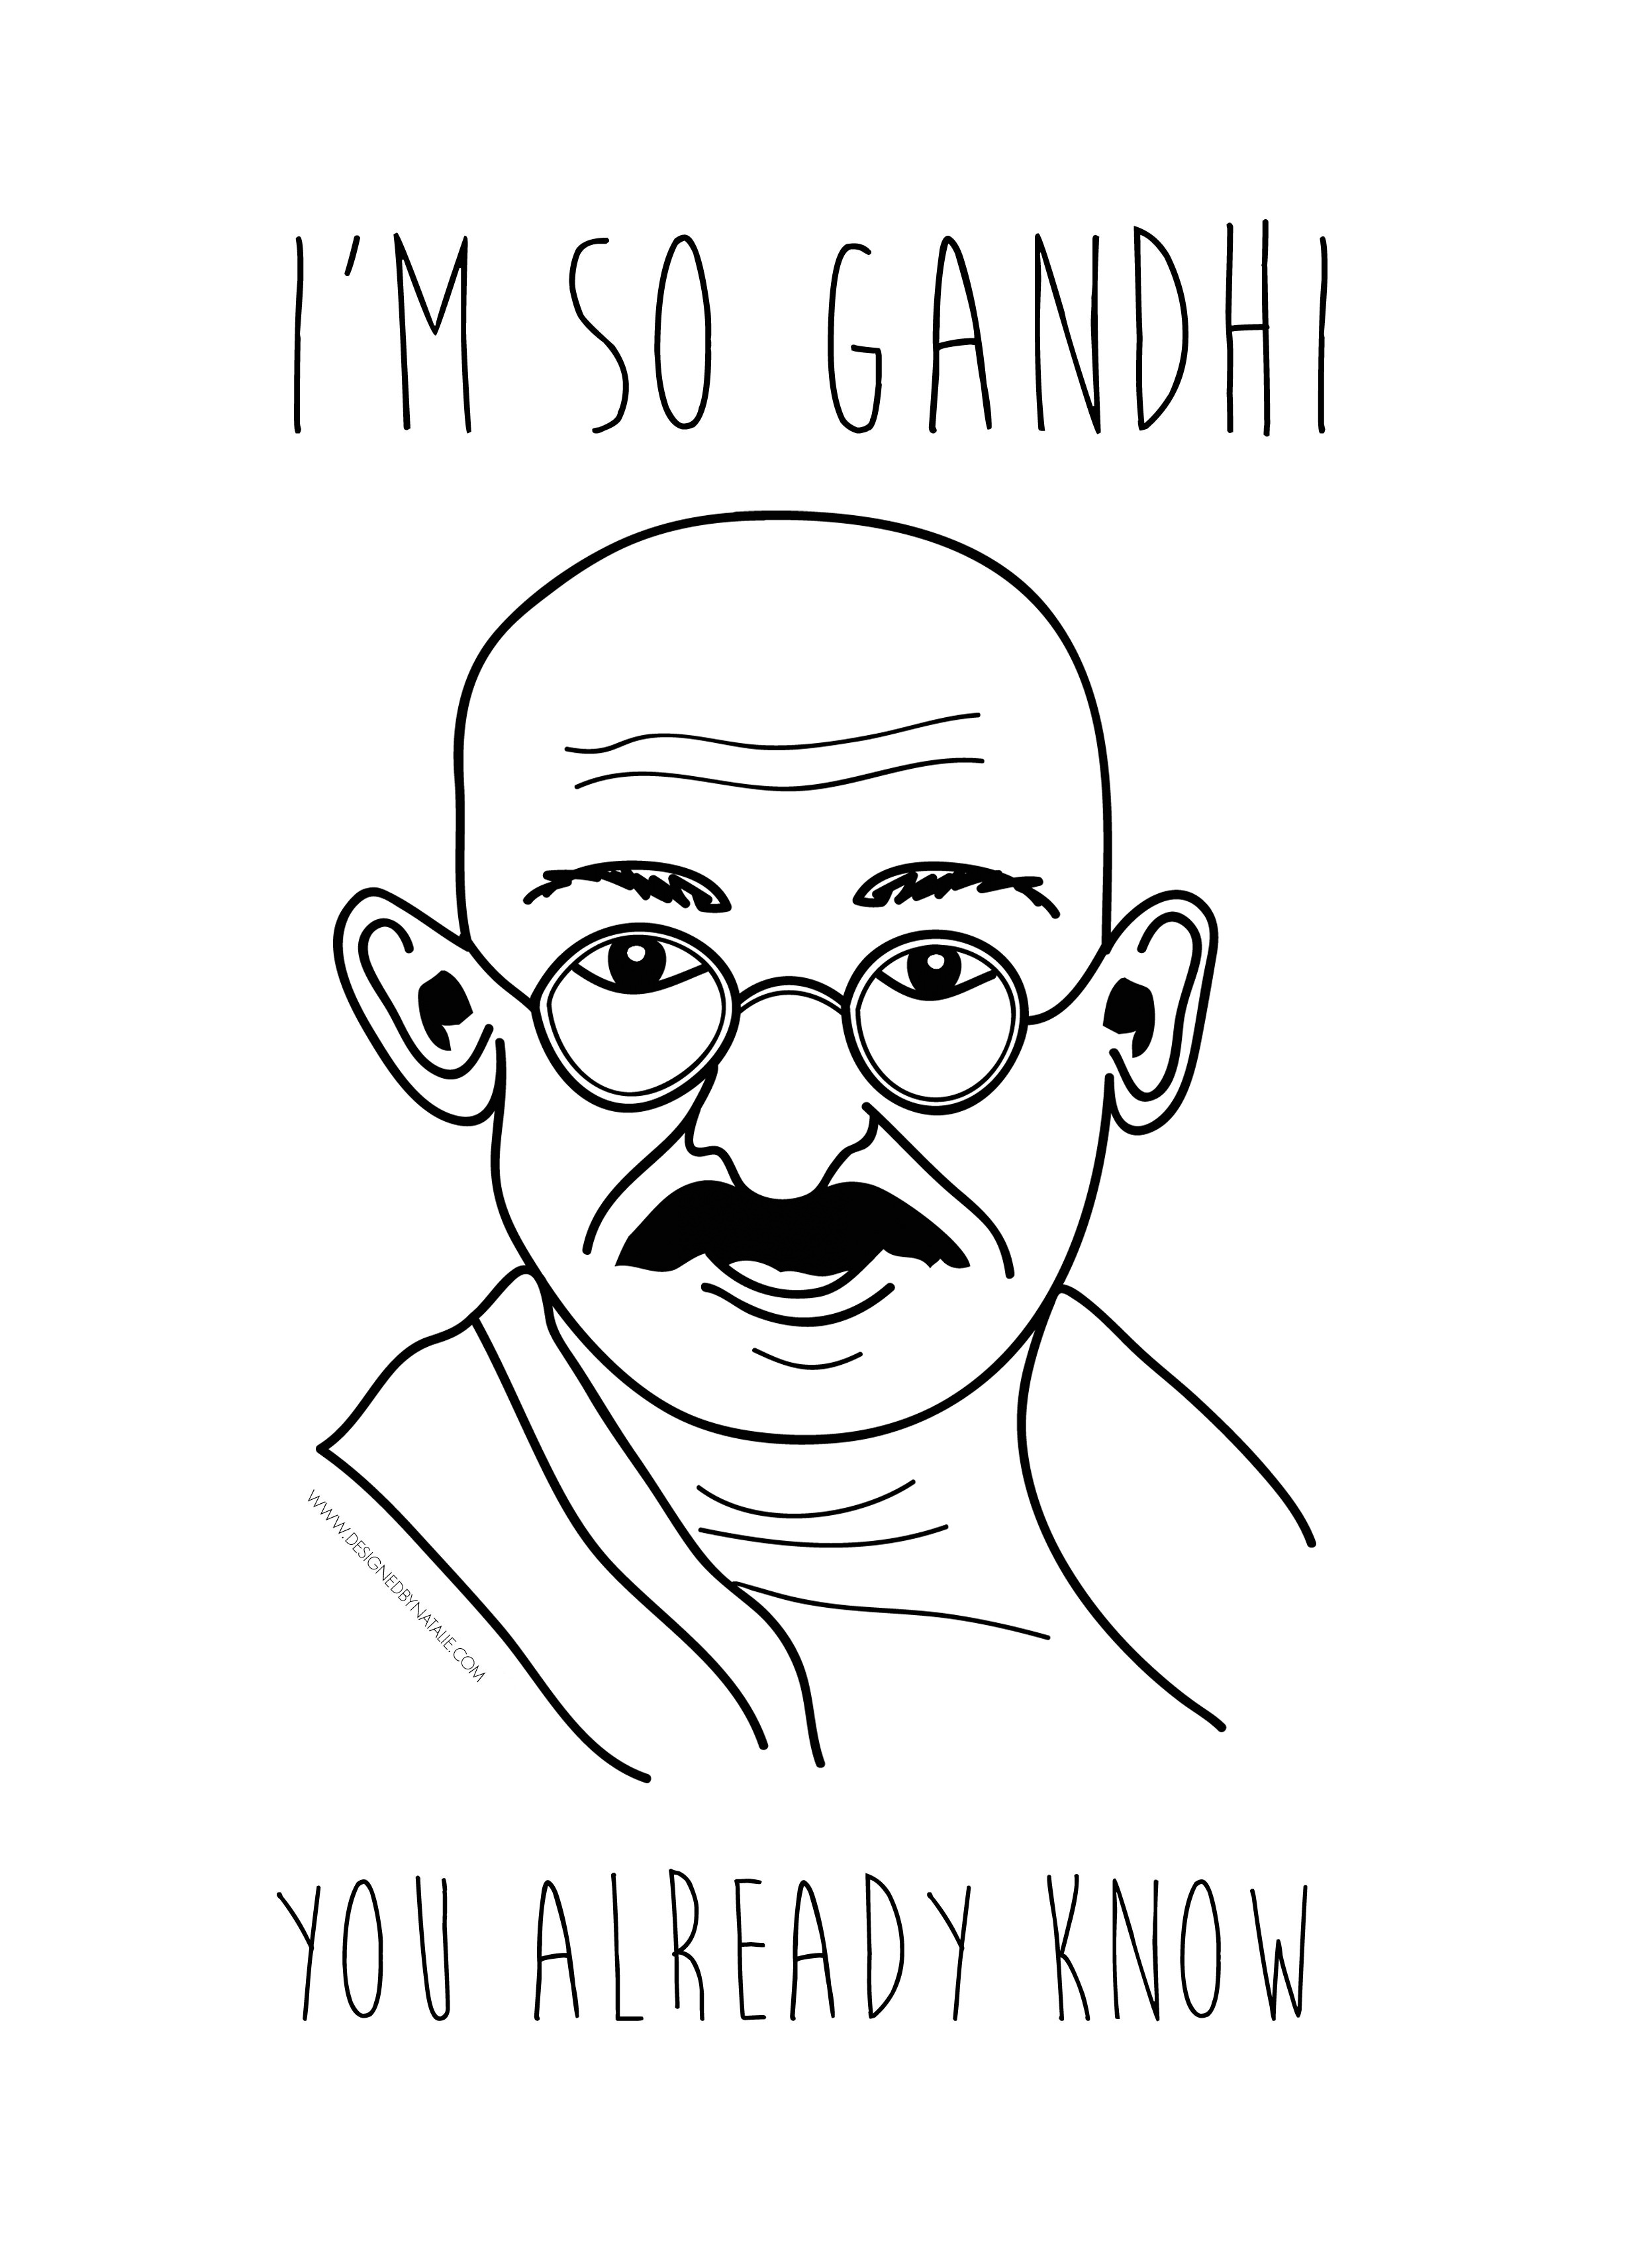 Im So Gandhi  Street Art Poster  Buy  Iggy Azalea